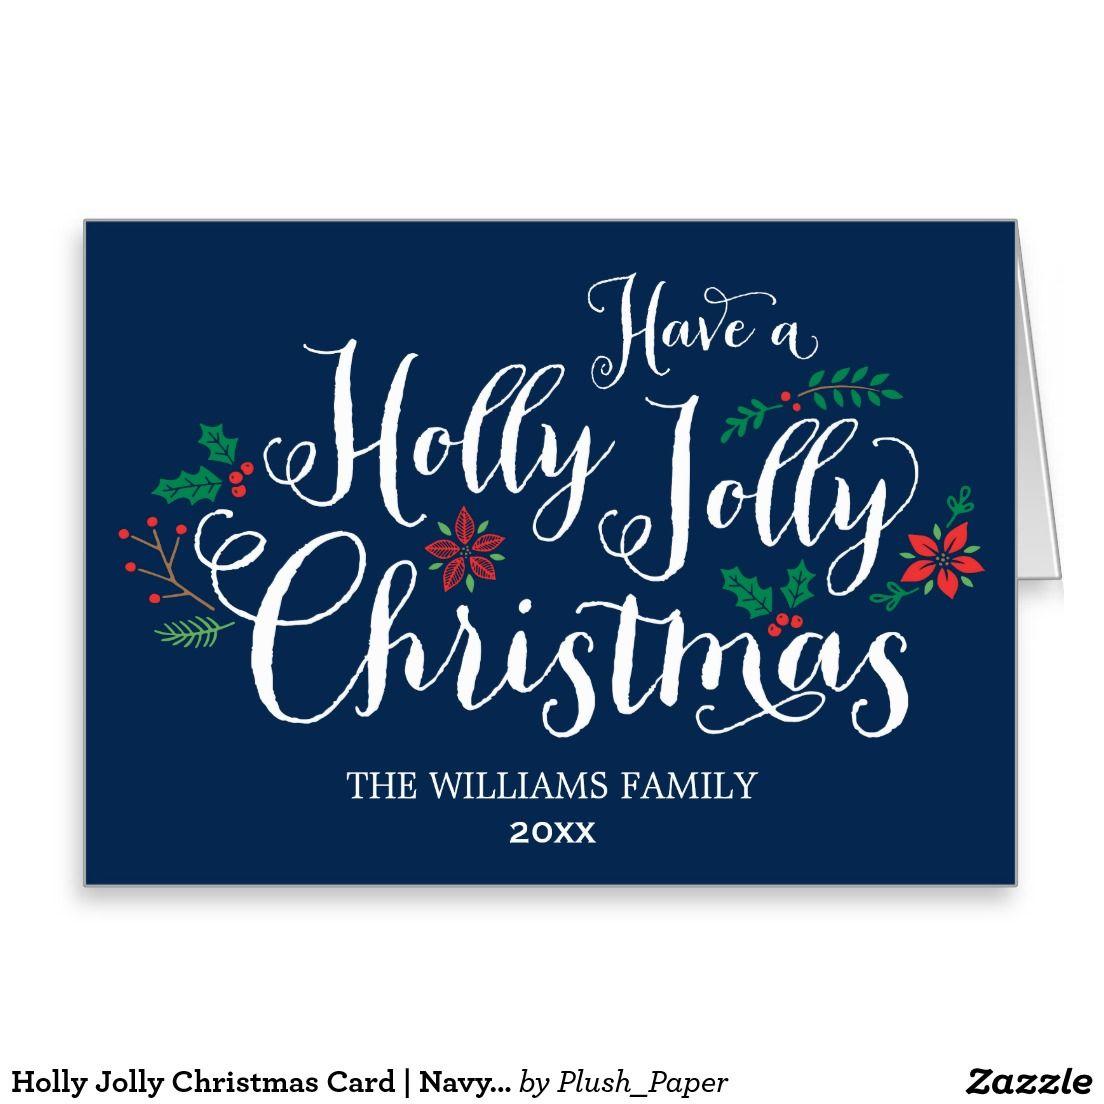 Holly Jolly Christmas Card Navy Blue Navy Blue Navy And Plush